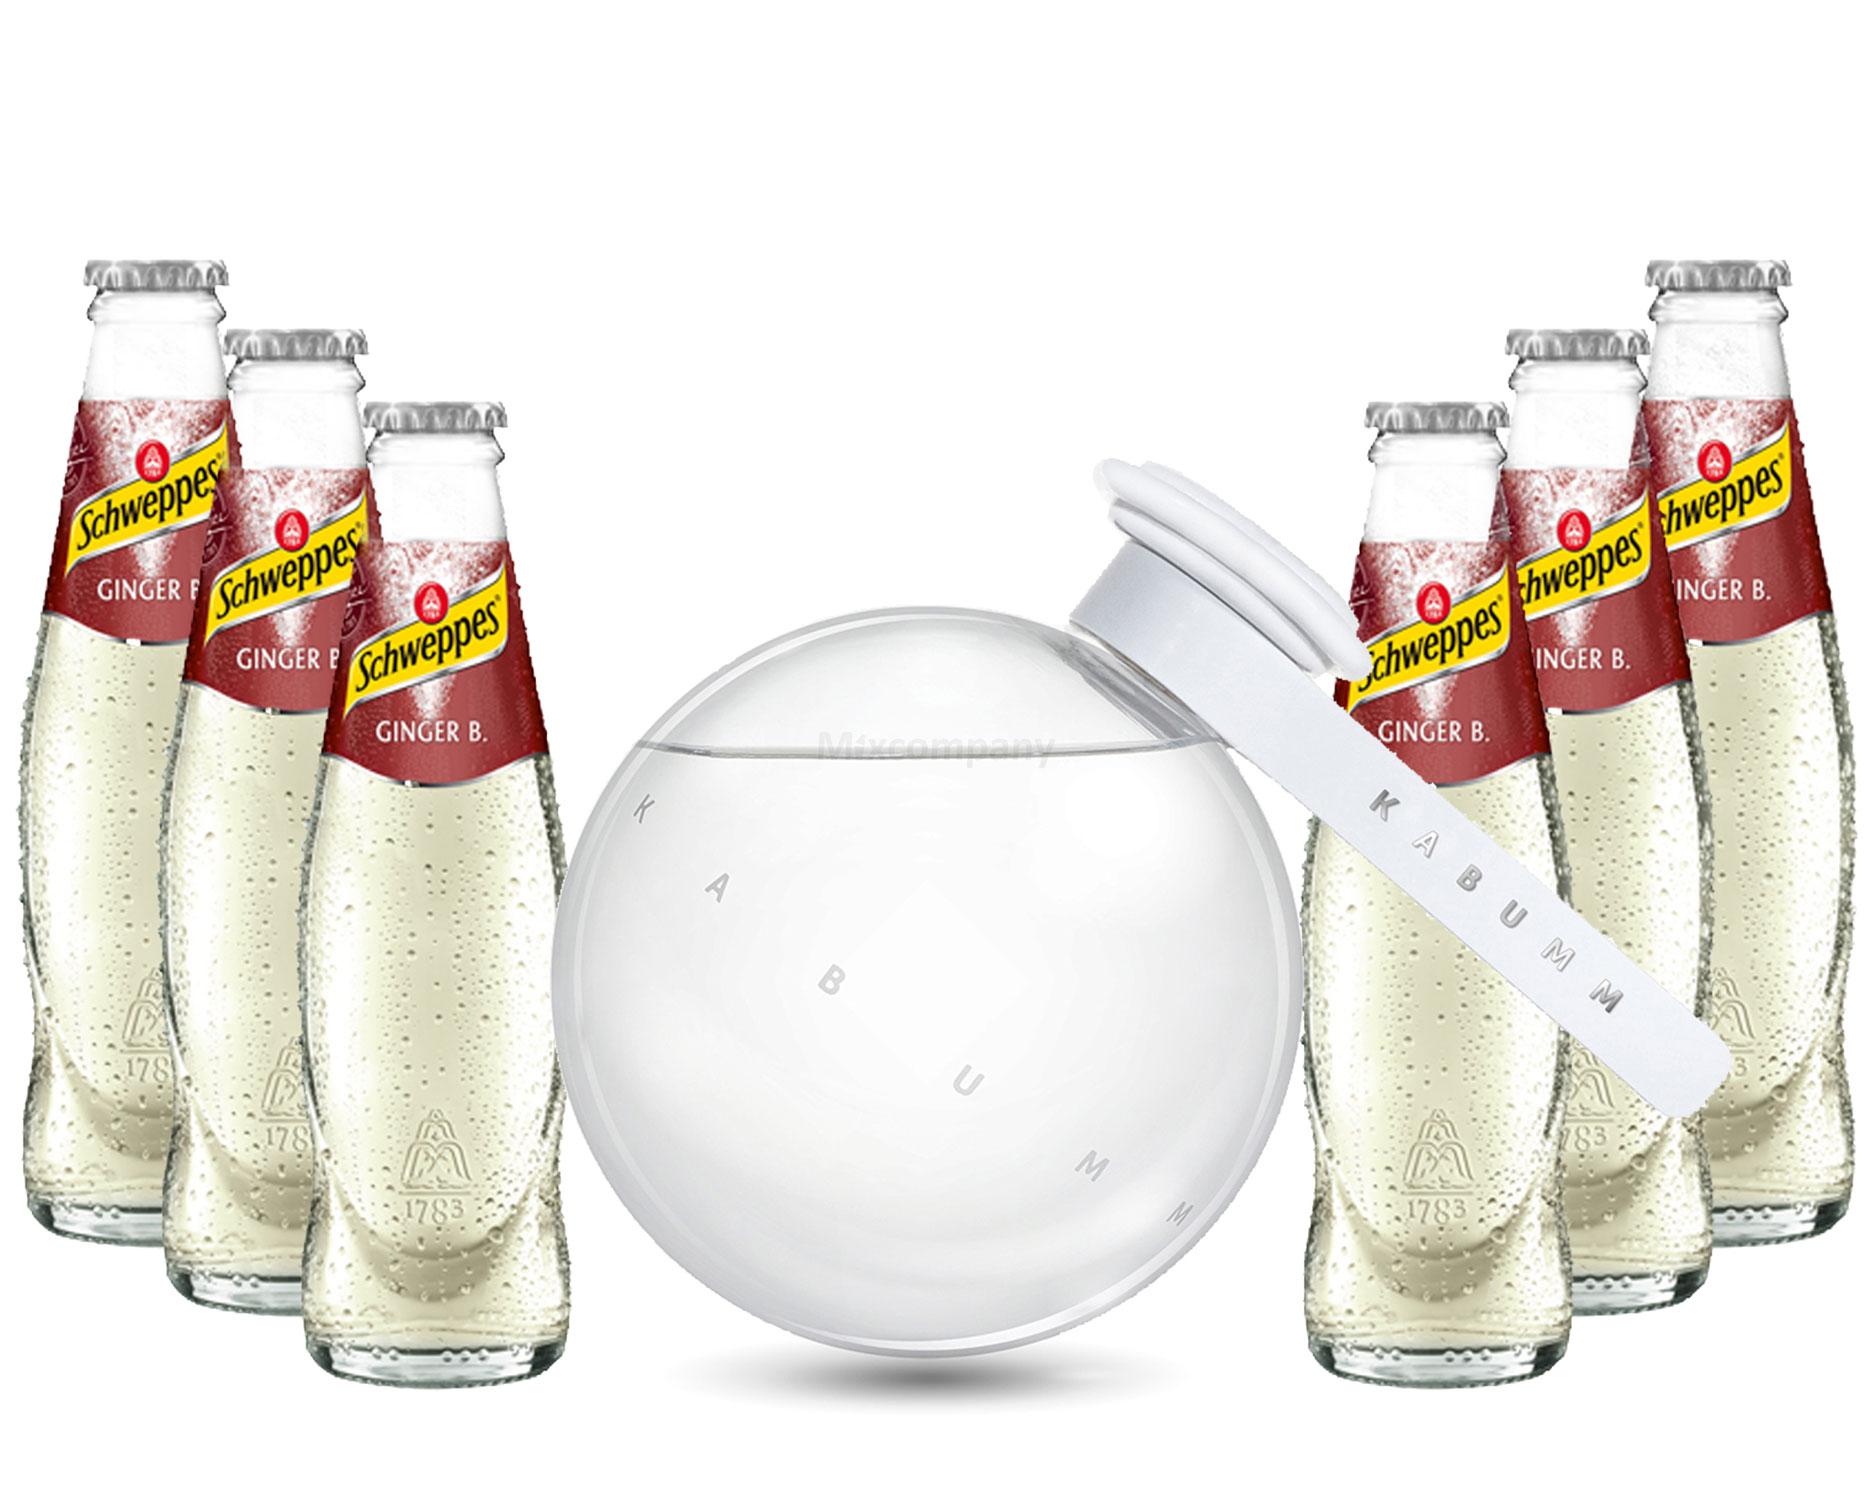 Moscow Mule Set - Kabumm Vodka 0,7l 700ml (40% Vol) + 6x Schweppes Ginger Beer 200ml - Inkl. Pfand MEHRWEG